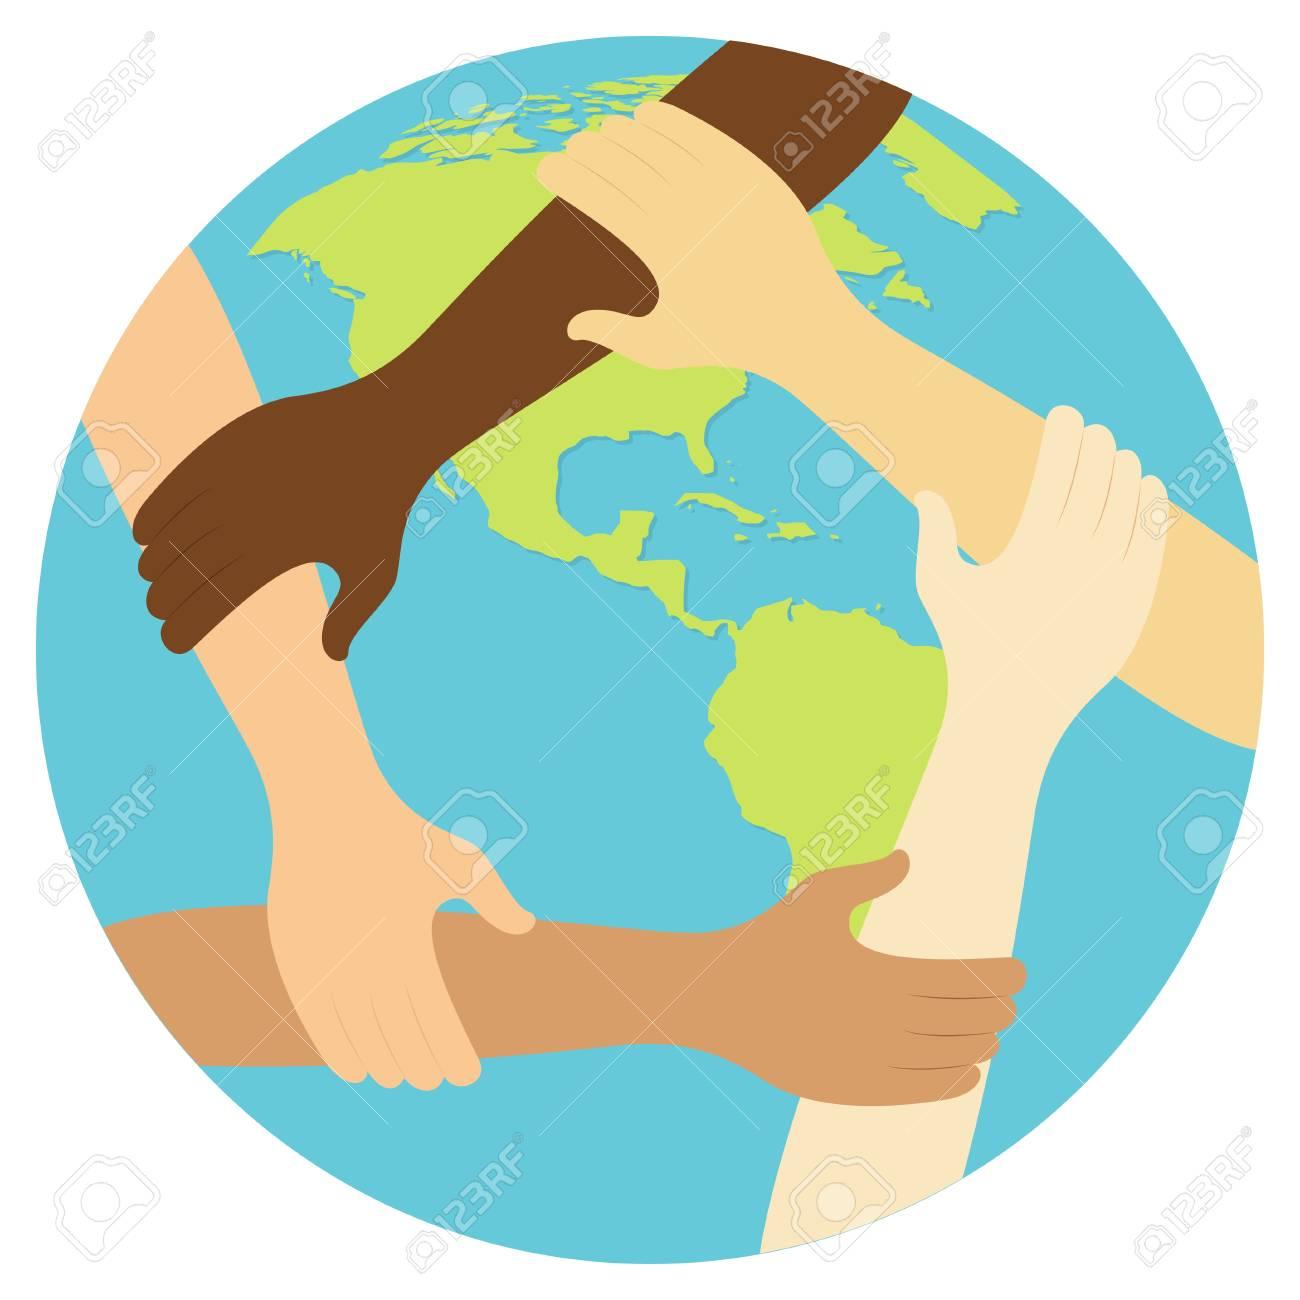 teamwork symbol ring of hands flat design icon Vector illustration. - 99408625